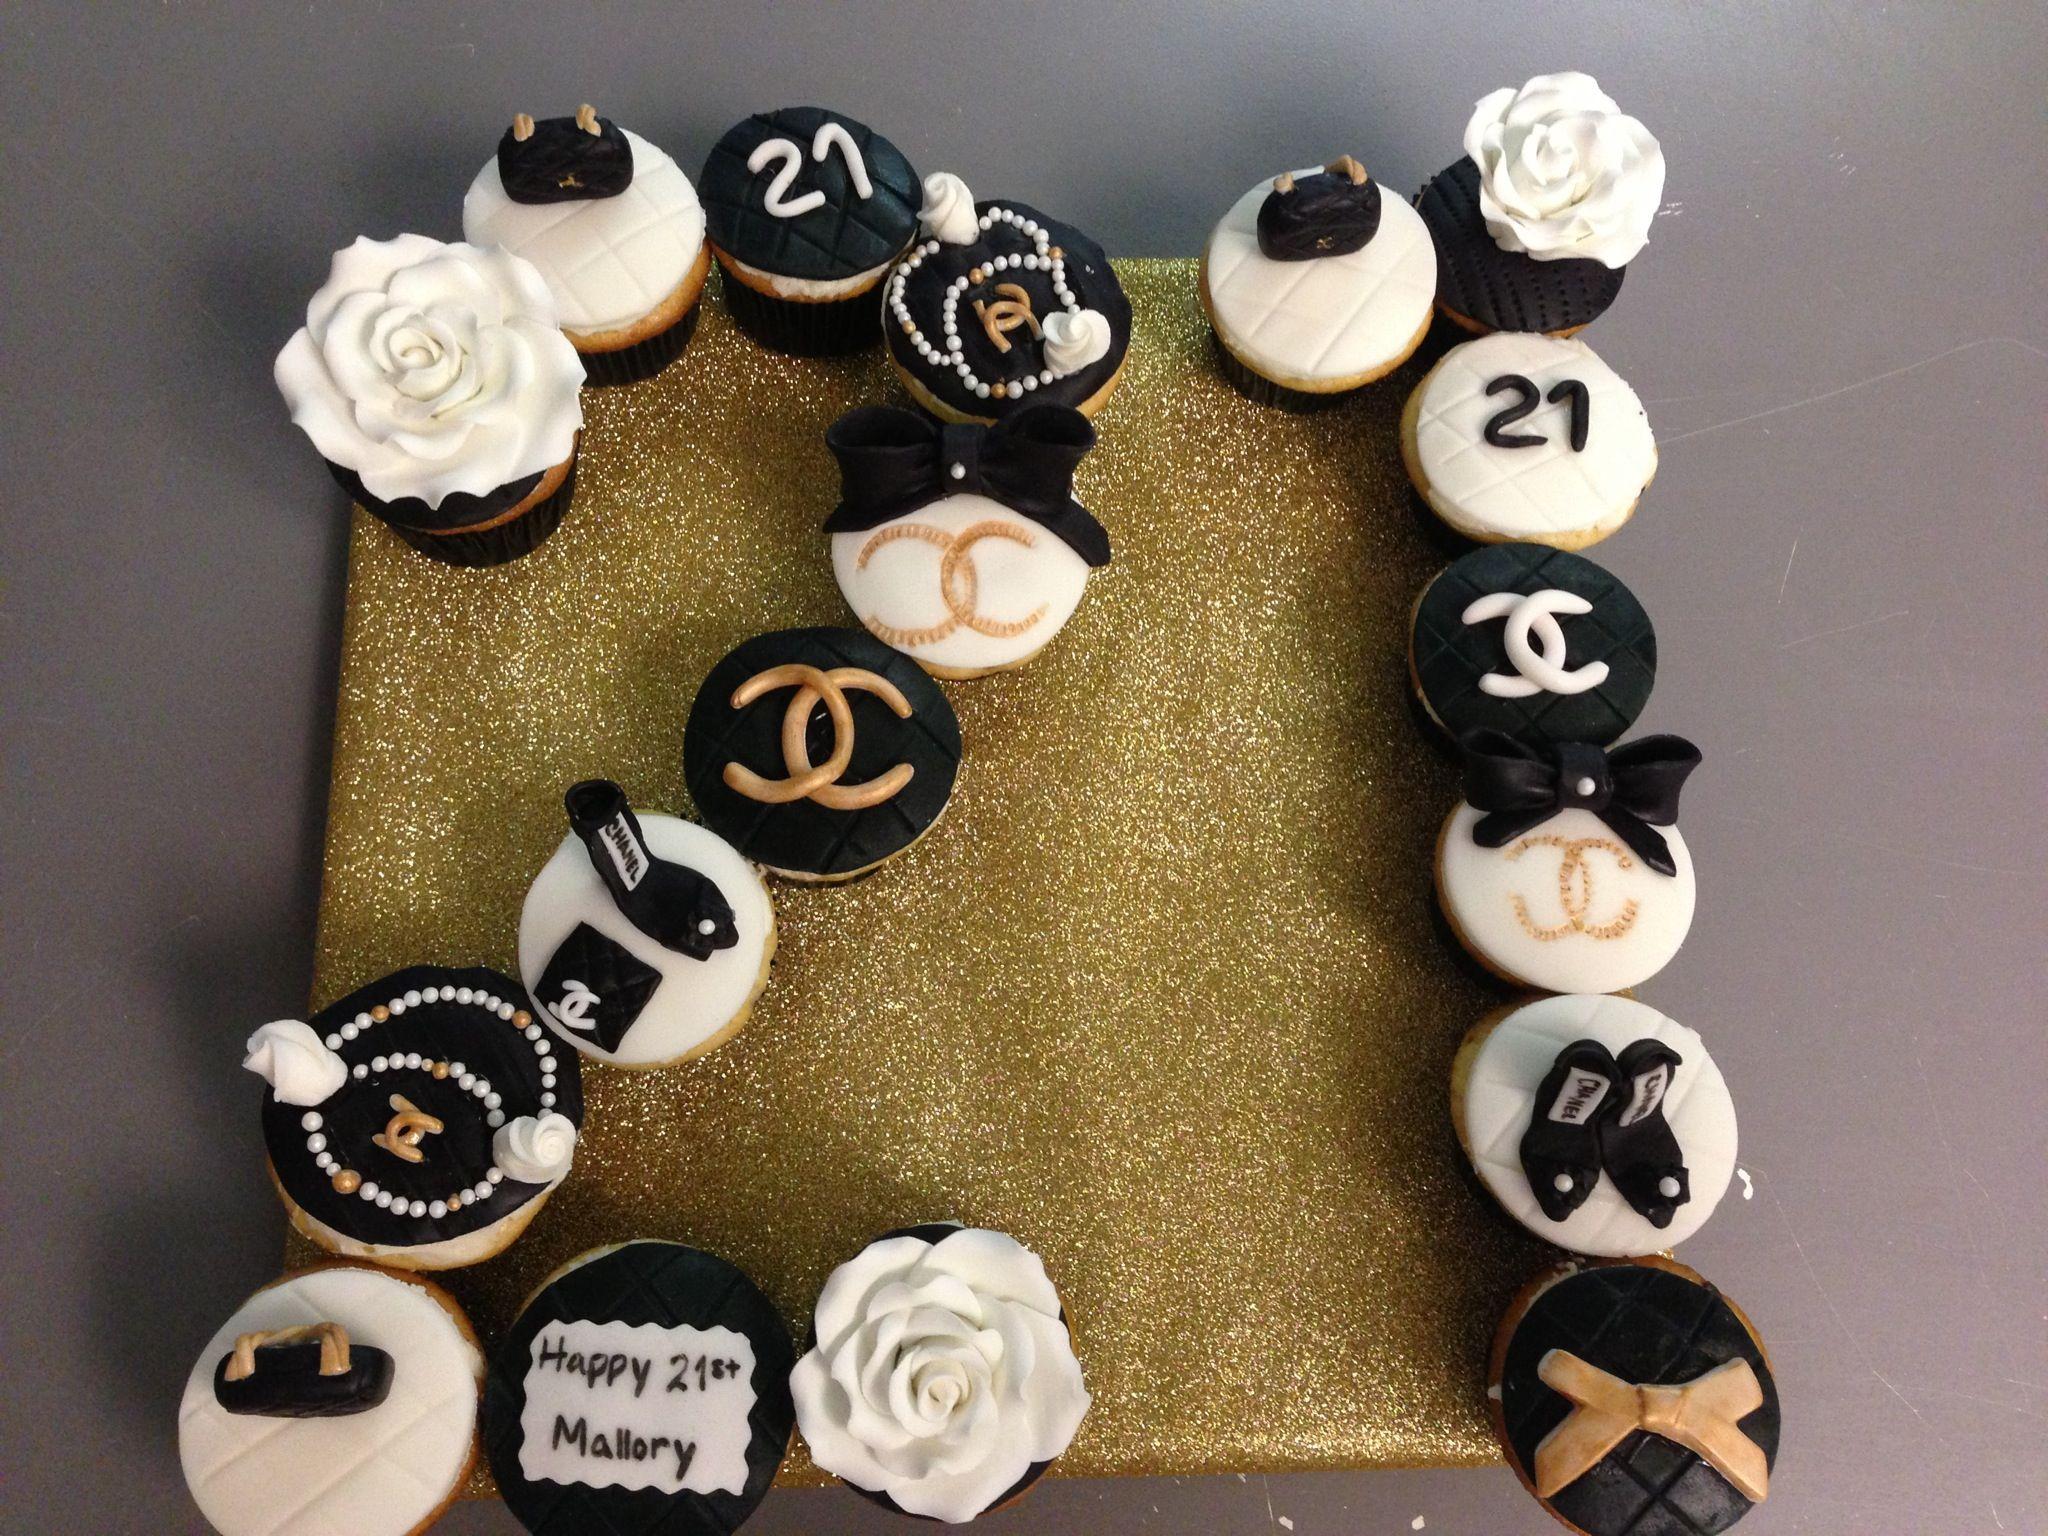 21st Birthday Chanel Cake Get Baked Cake Company 21st